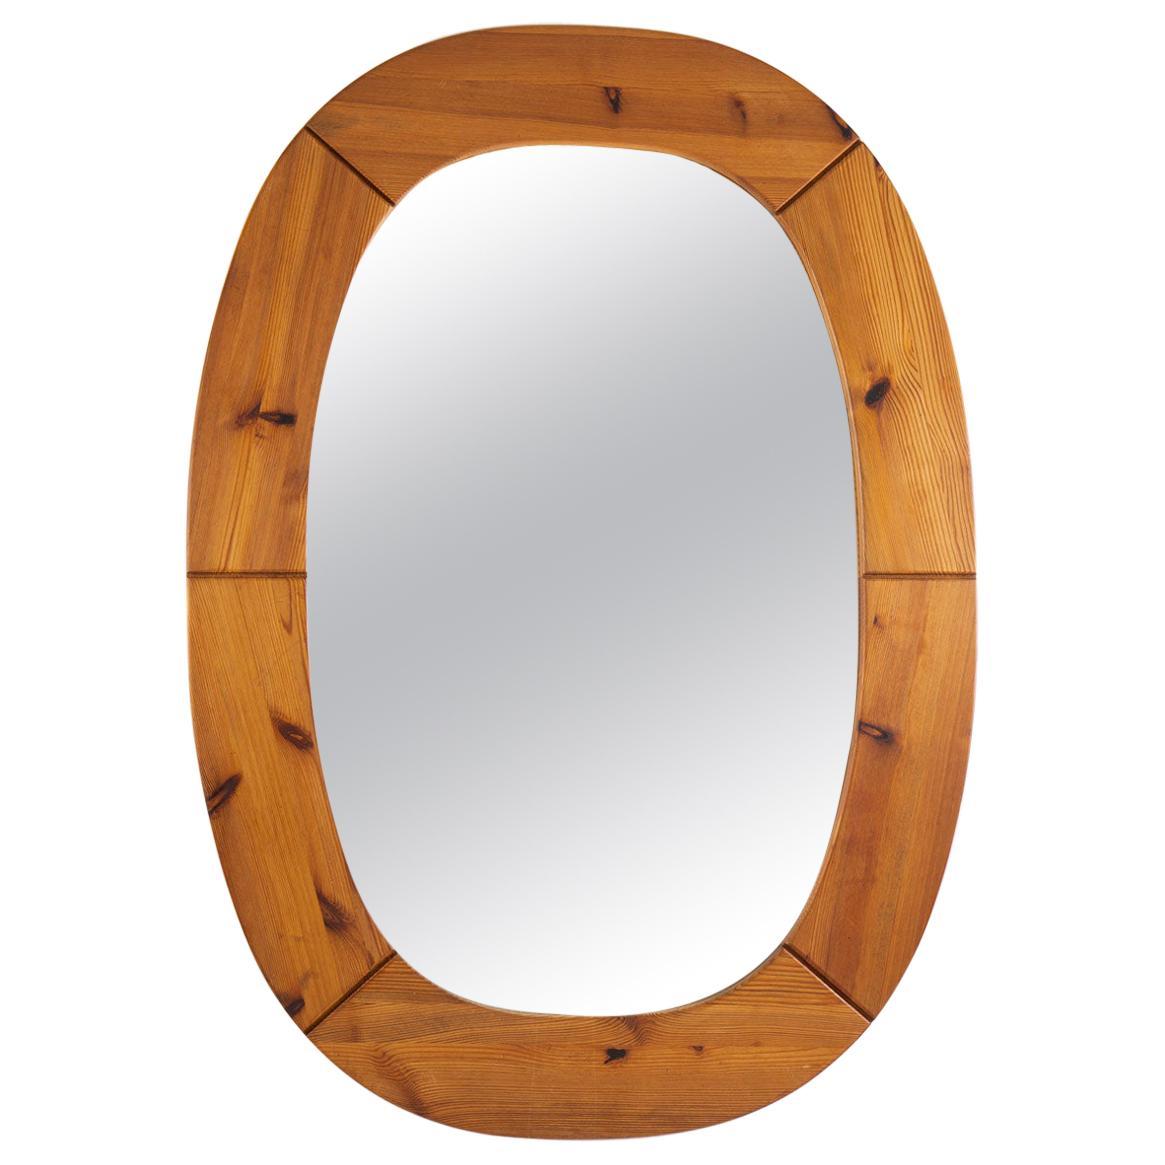 Oversized Swedish Mirror in Pine, by Glasmäster Markaryd